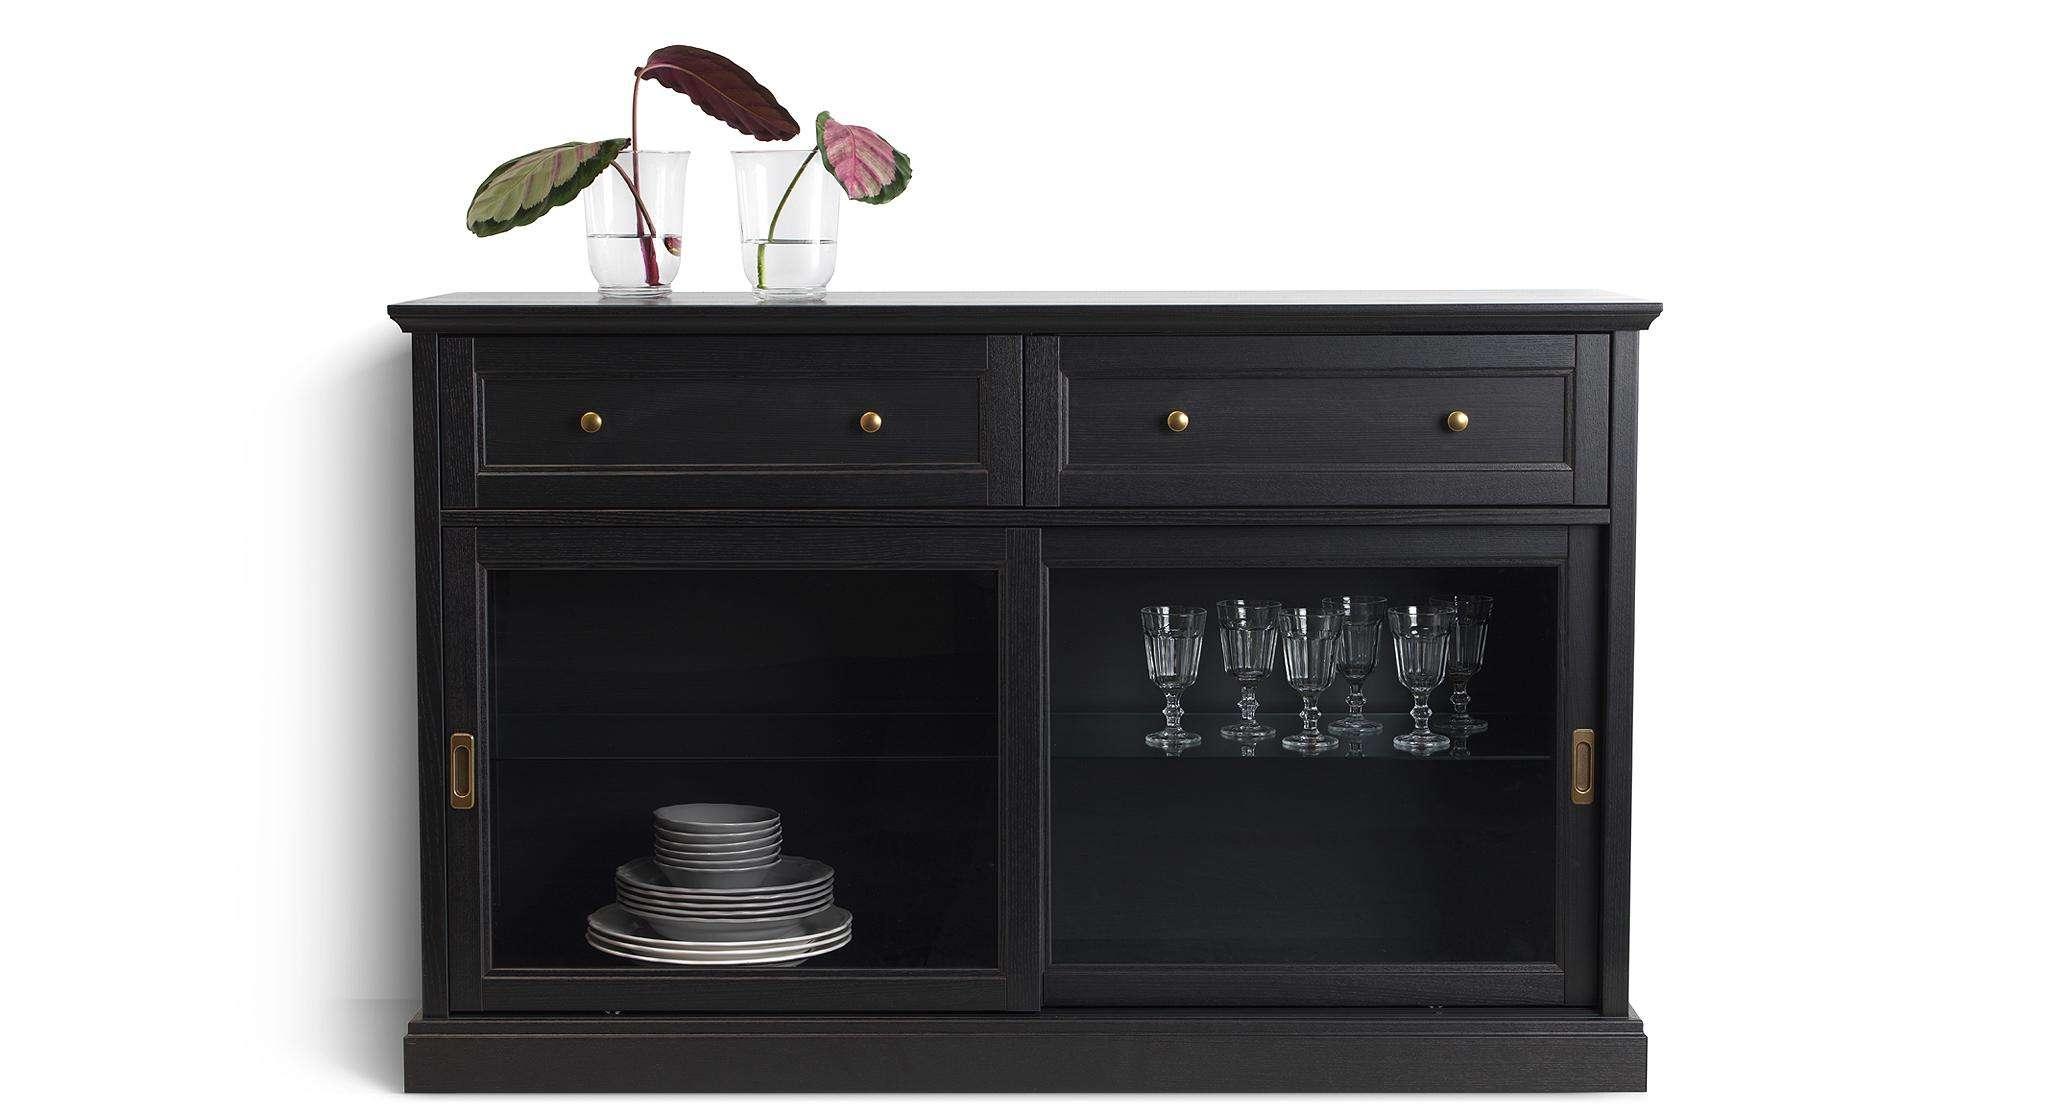 Sideboards & Buffet Cabinets | Ikea Inside Black Buffet Sideboards (View 9 of 20)